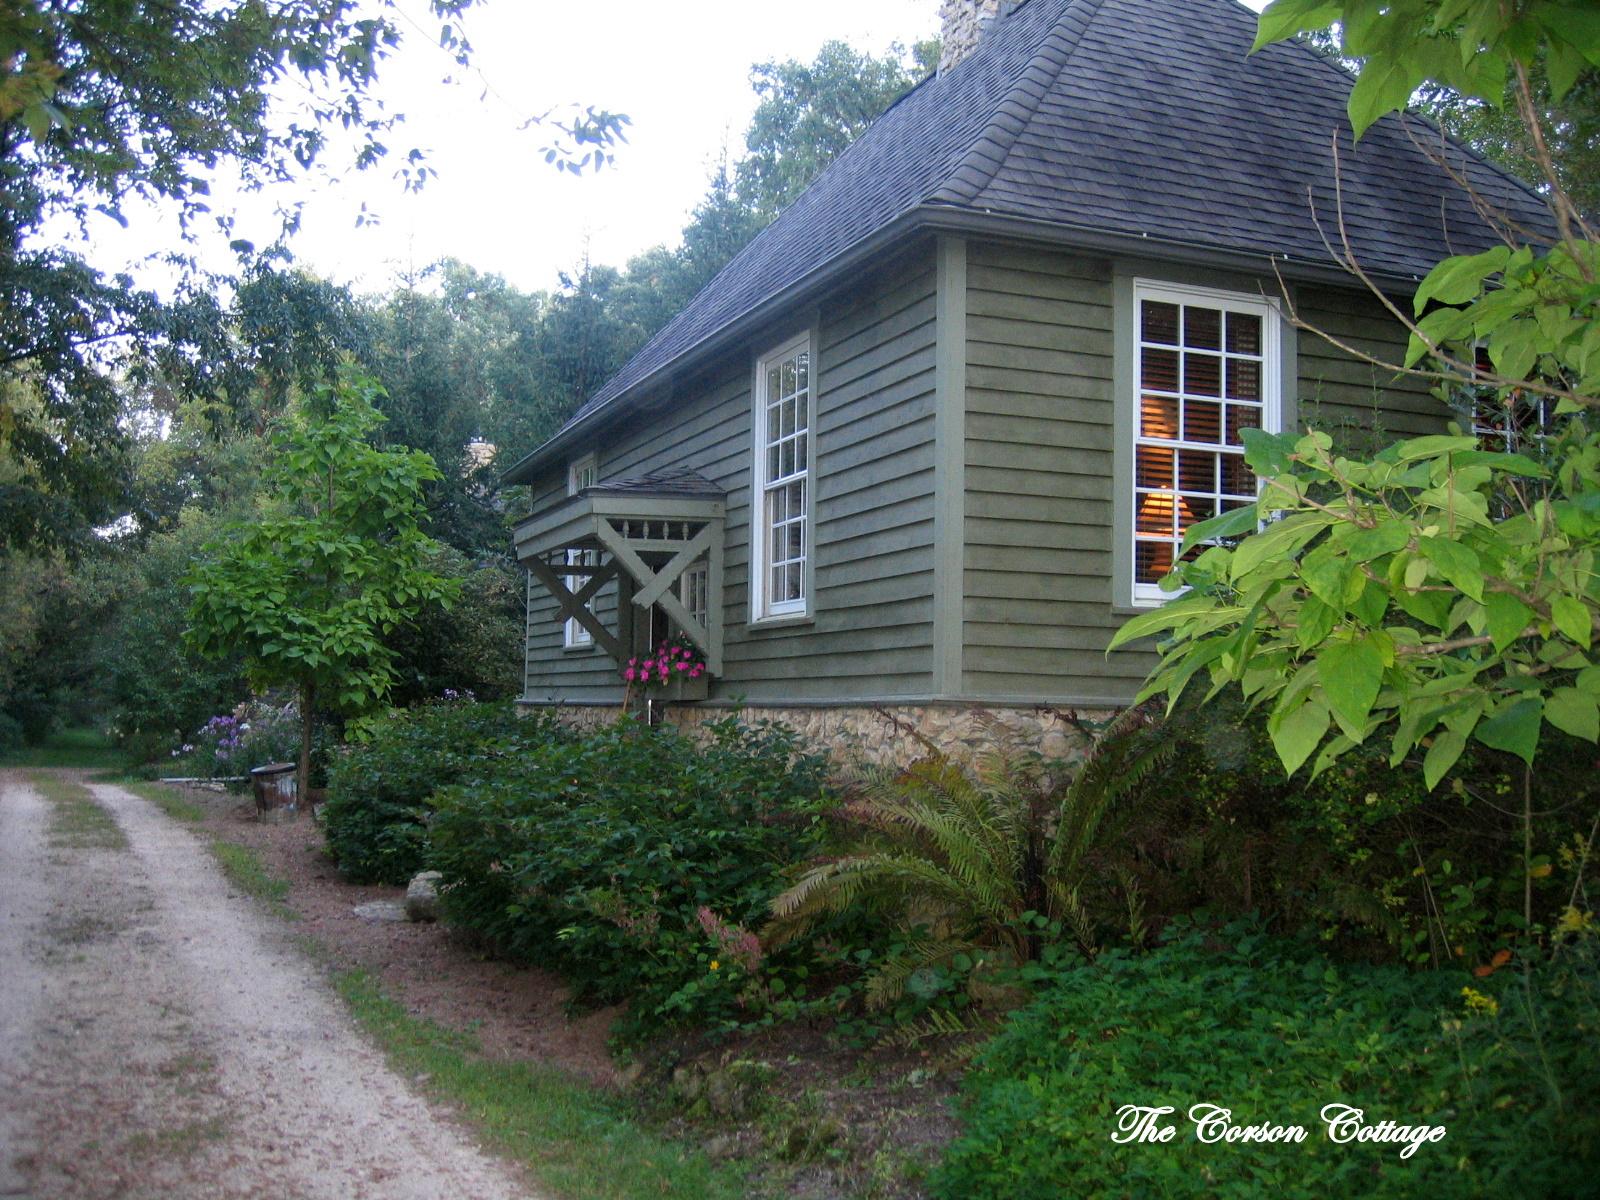 the corson cottage the inn at irish hollow